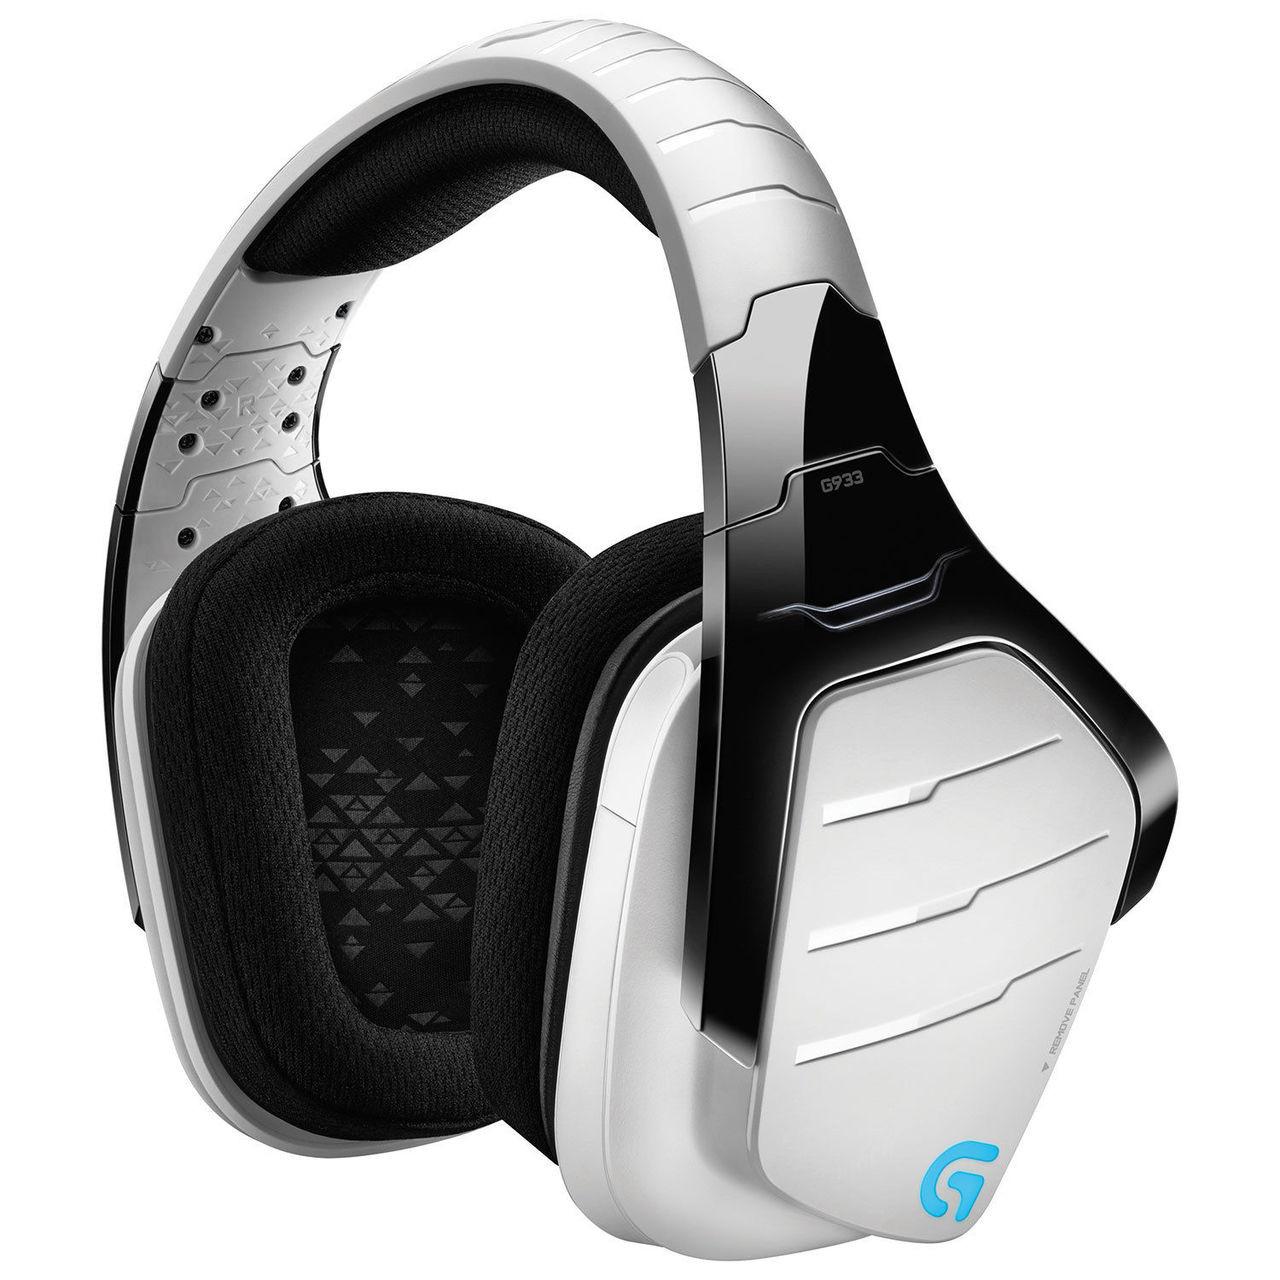 Logitech G933 White Artemis Spectrum RGB 7.1 Surround Sound Gaming Headset - Refurbished